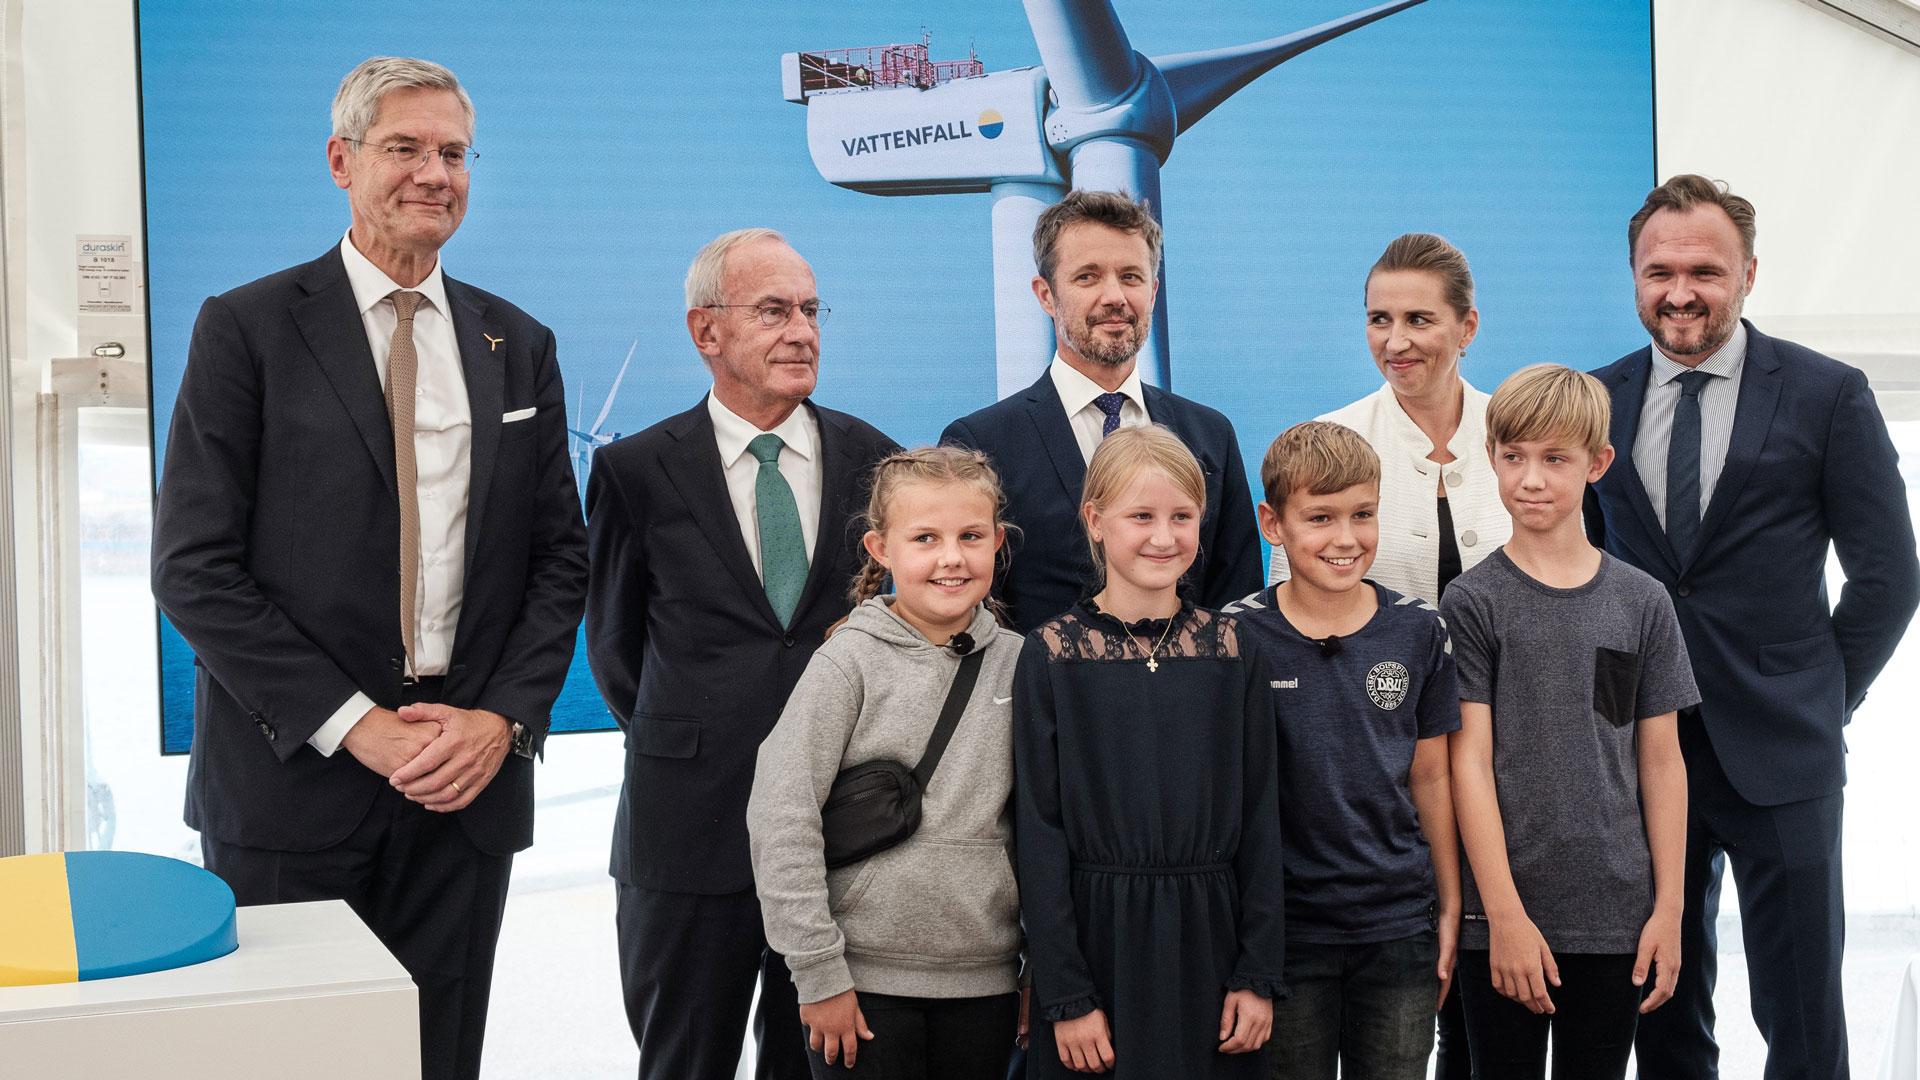 Grootste offshore windpark van Scandinavië geopend